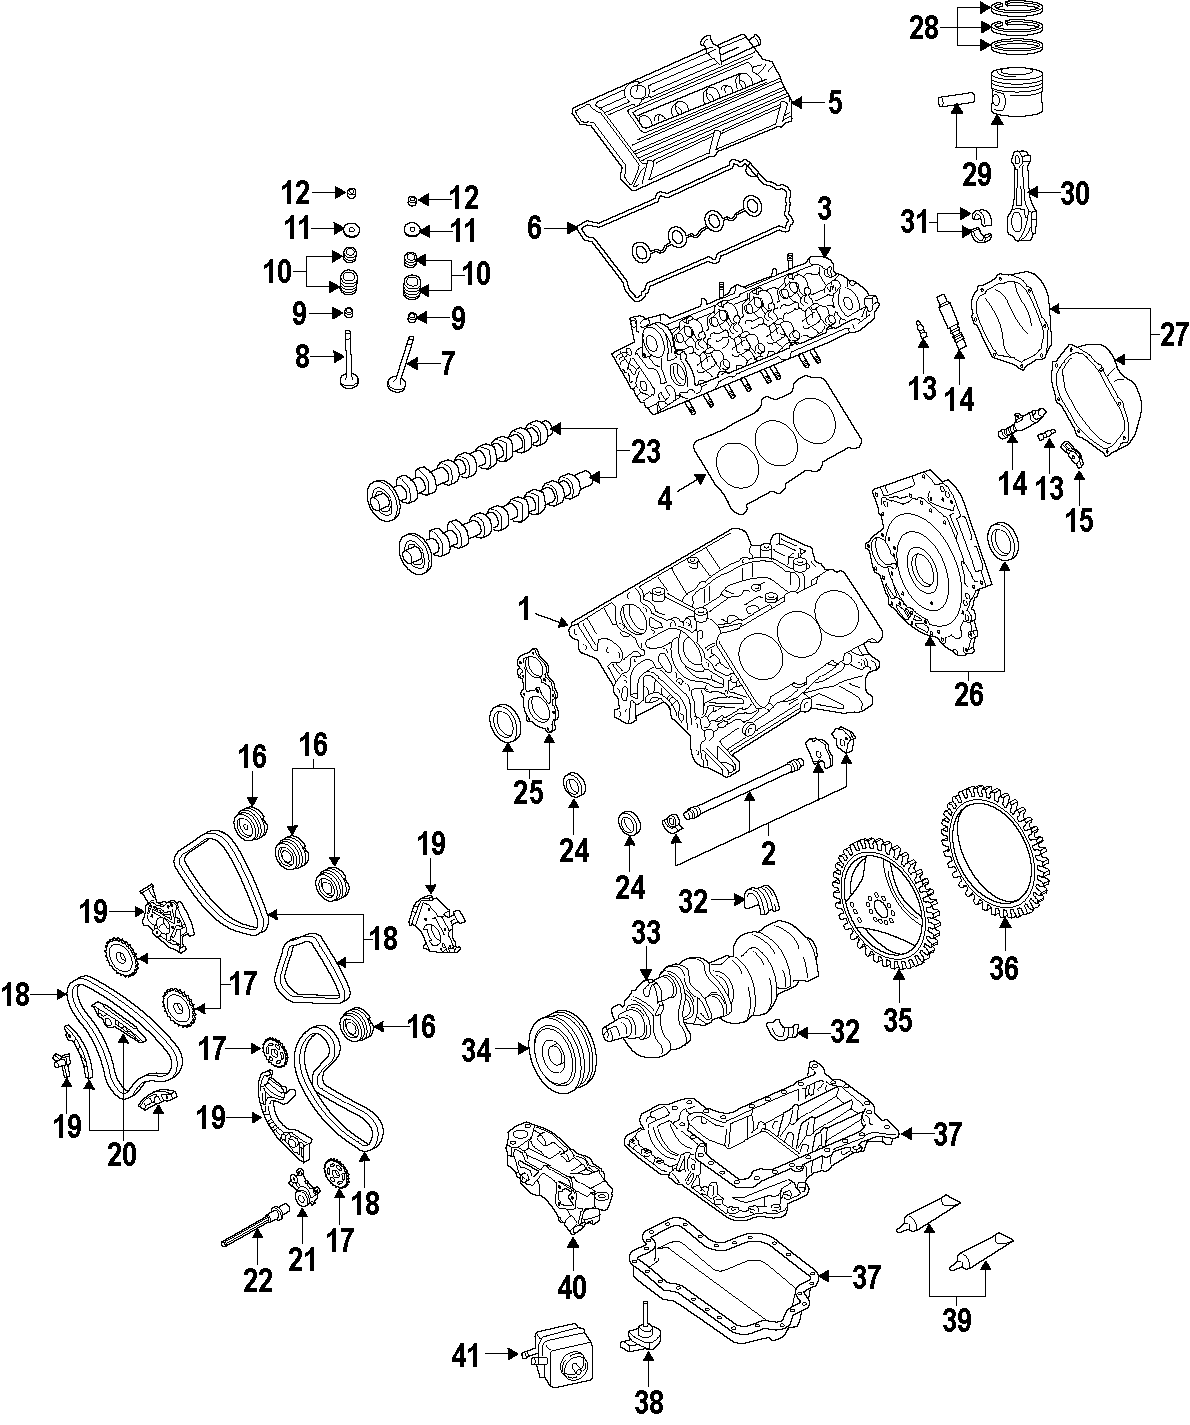 2010 Audi A4 Engine Cylinder Head Gasket. A4; Cylinders 1